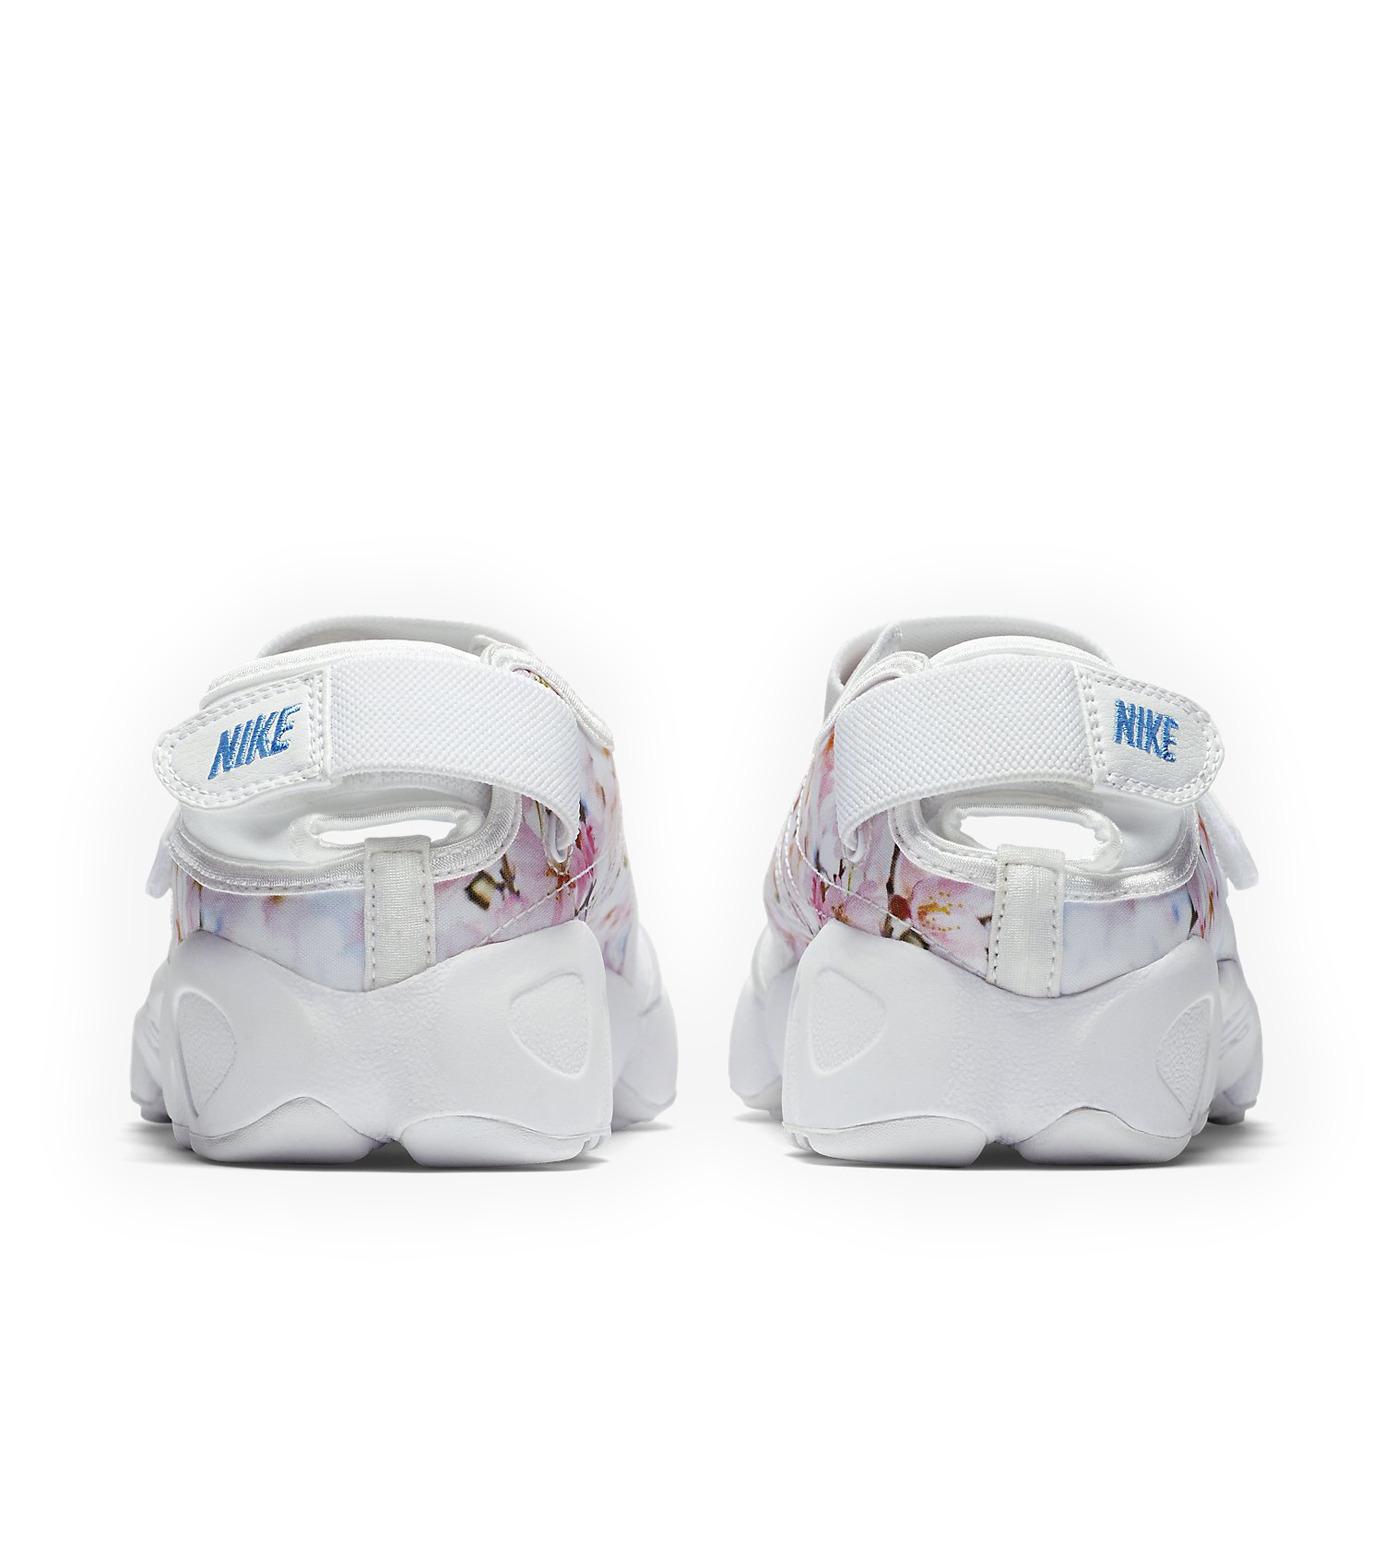 NIKE(ナイキ)のAIR RIFT PRINT-WHITE(シューズ/shoes)-807398-101-4 拡大詳細画像6